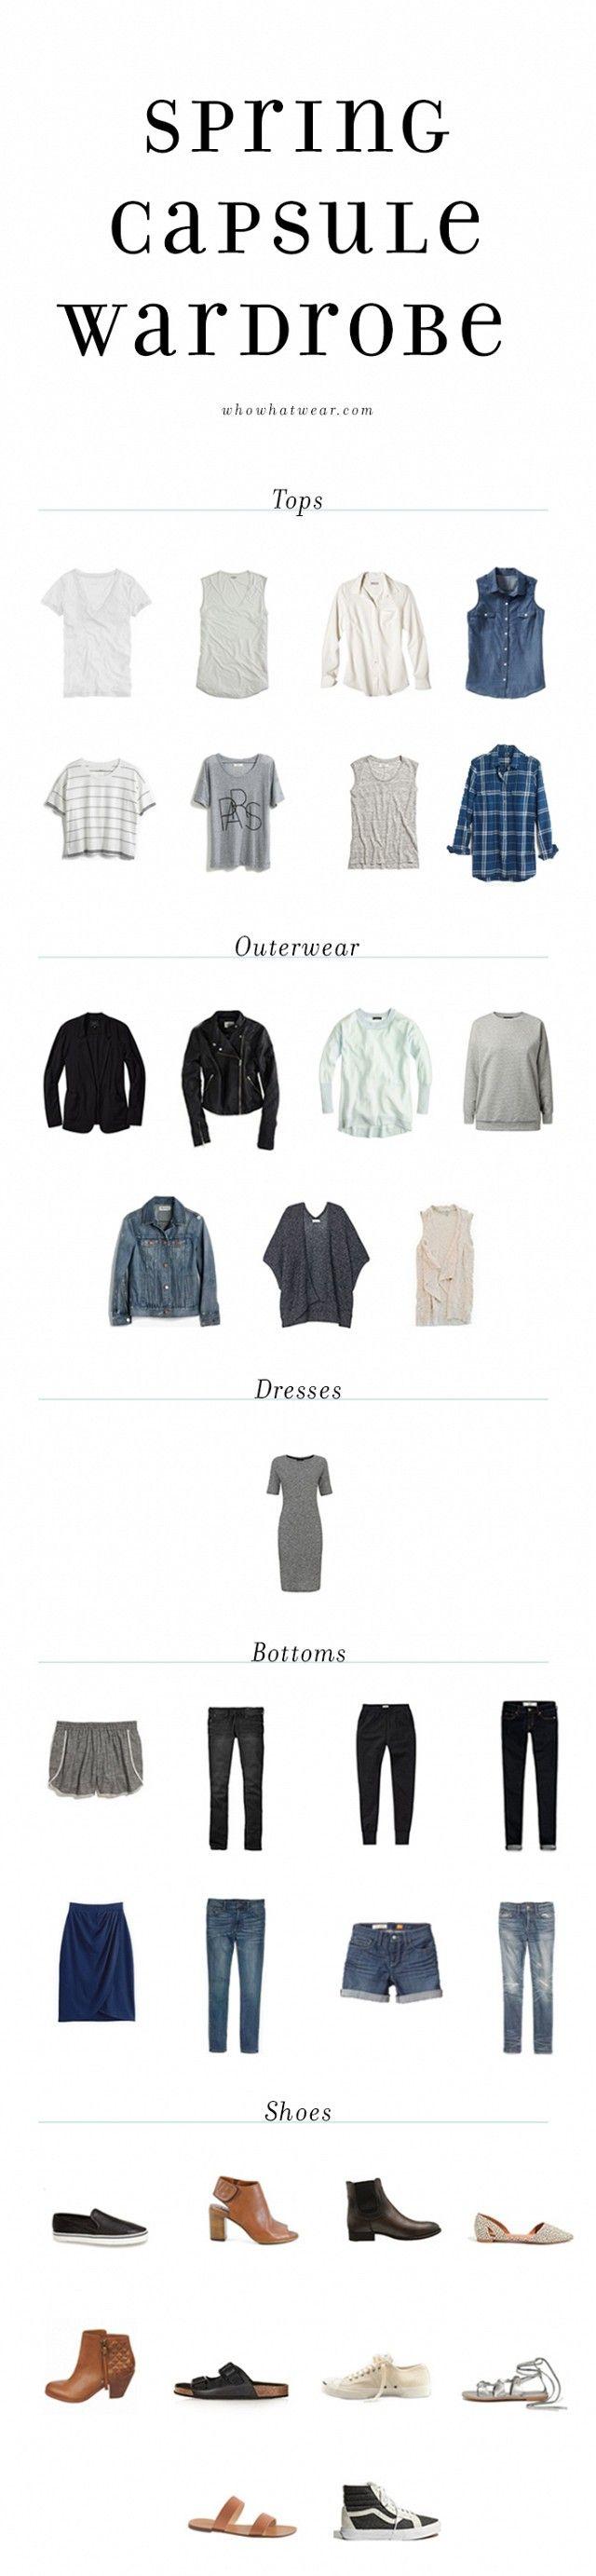 Capsule Wardrobe Unfancy 39 pieces - 8 shirts, 8 bottoms, 7 jackets, 1 dress, 10 shoes